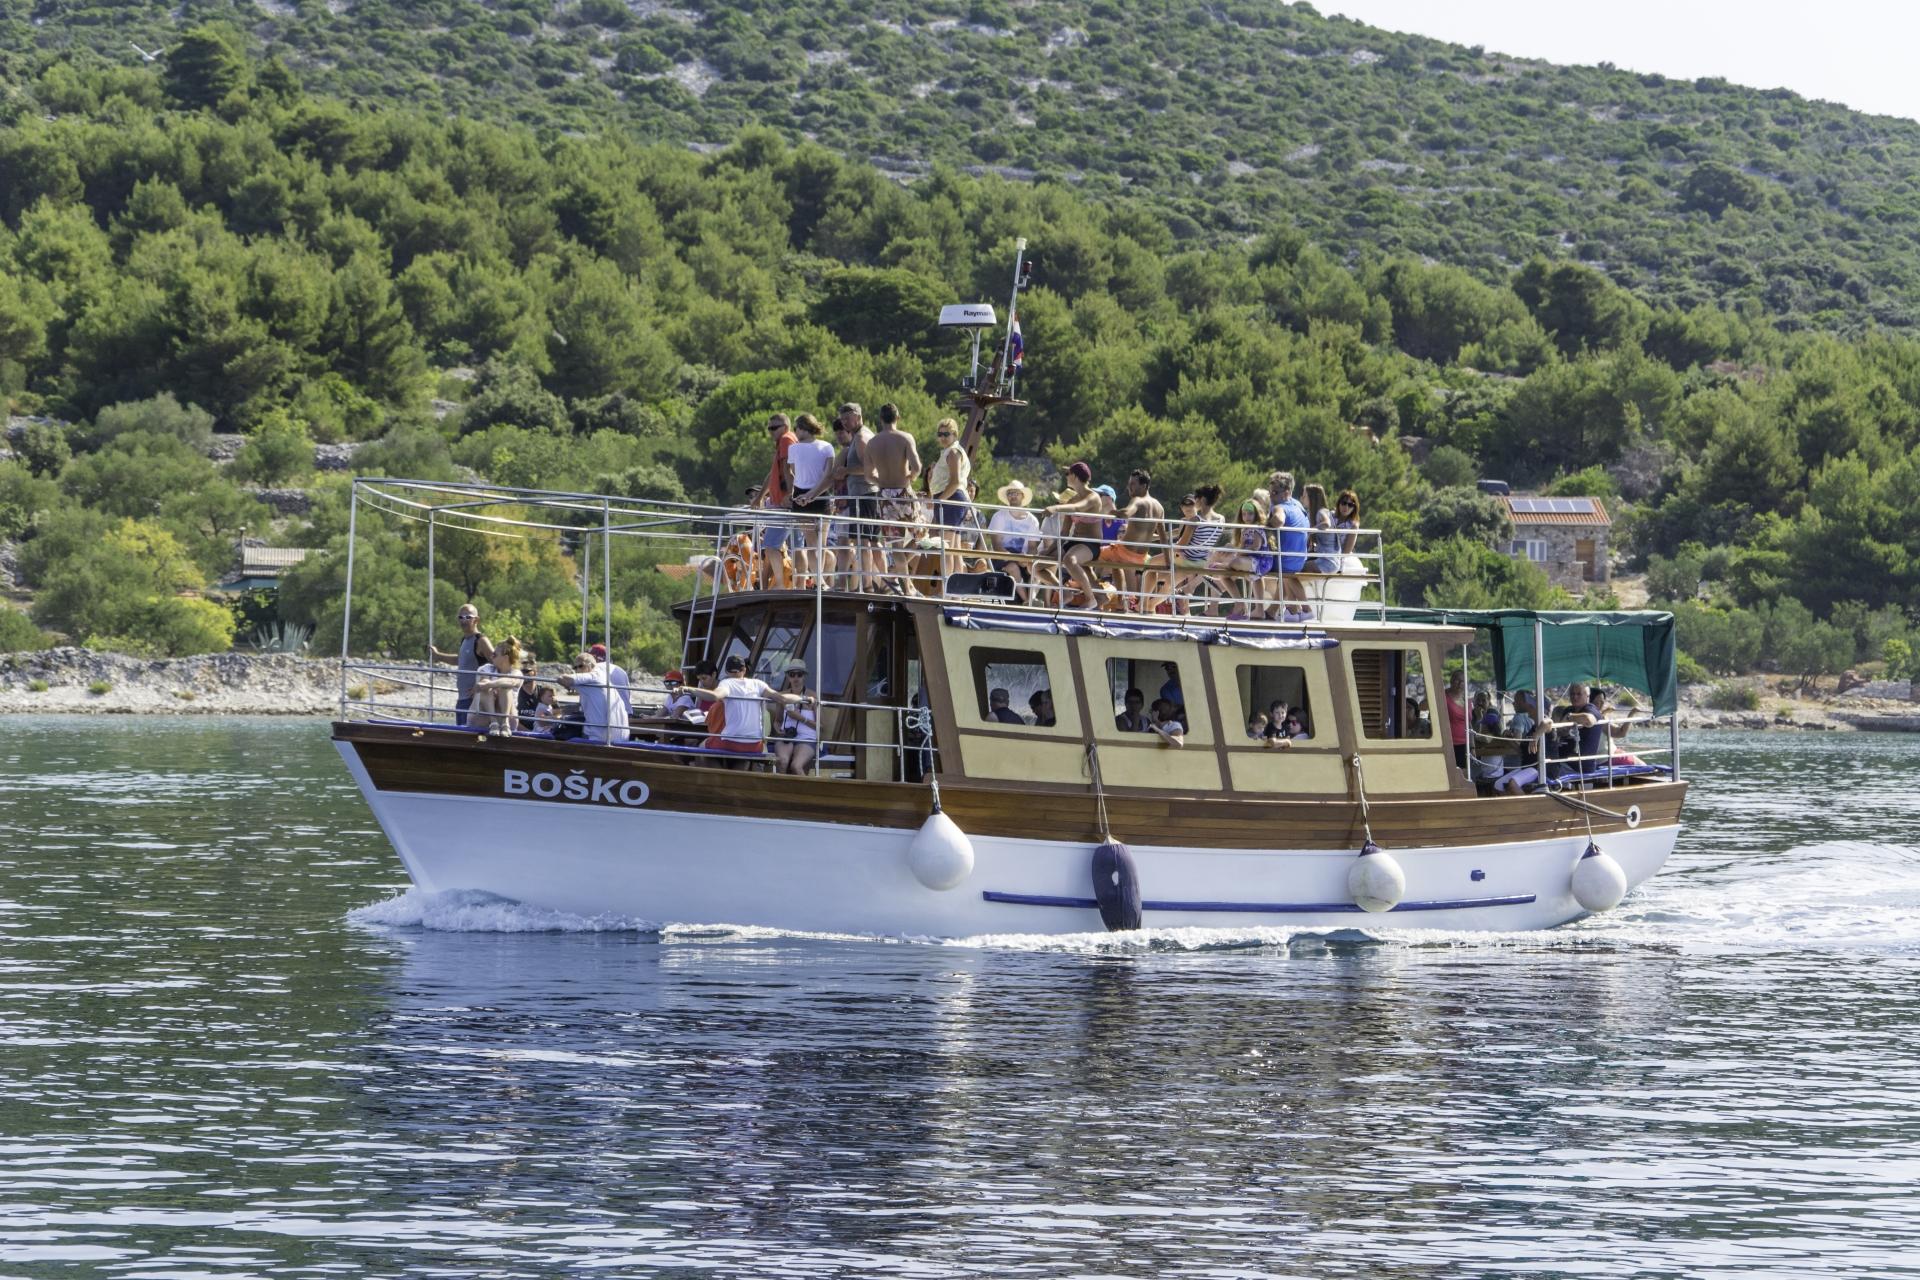 Boat Kornati island